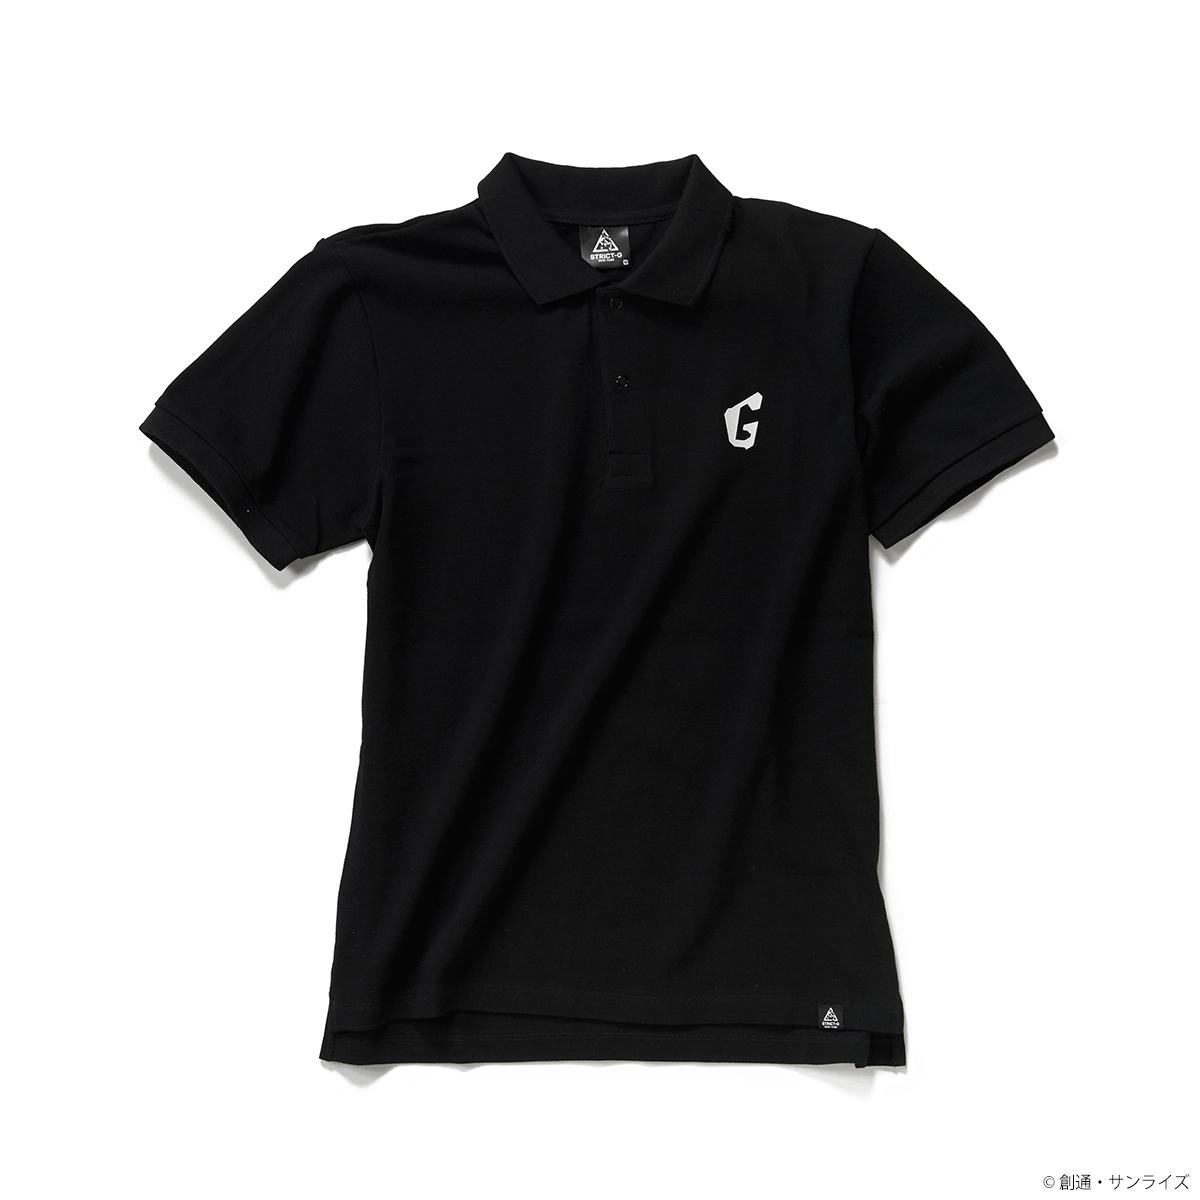 「STRICT-G NEW YARK」ポロシャツ ガンダムフェイス柄